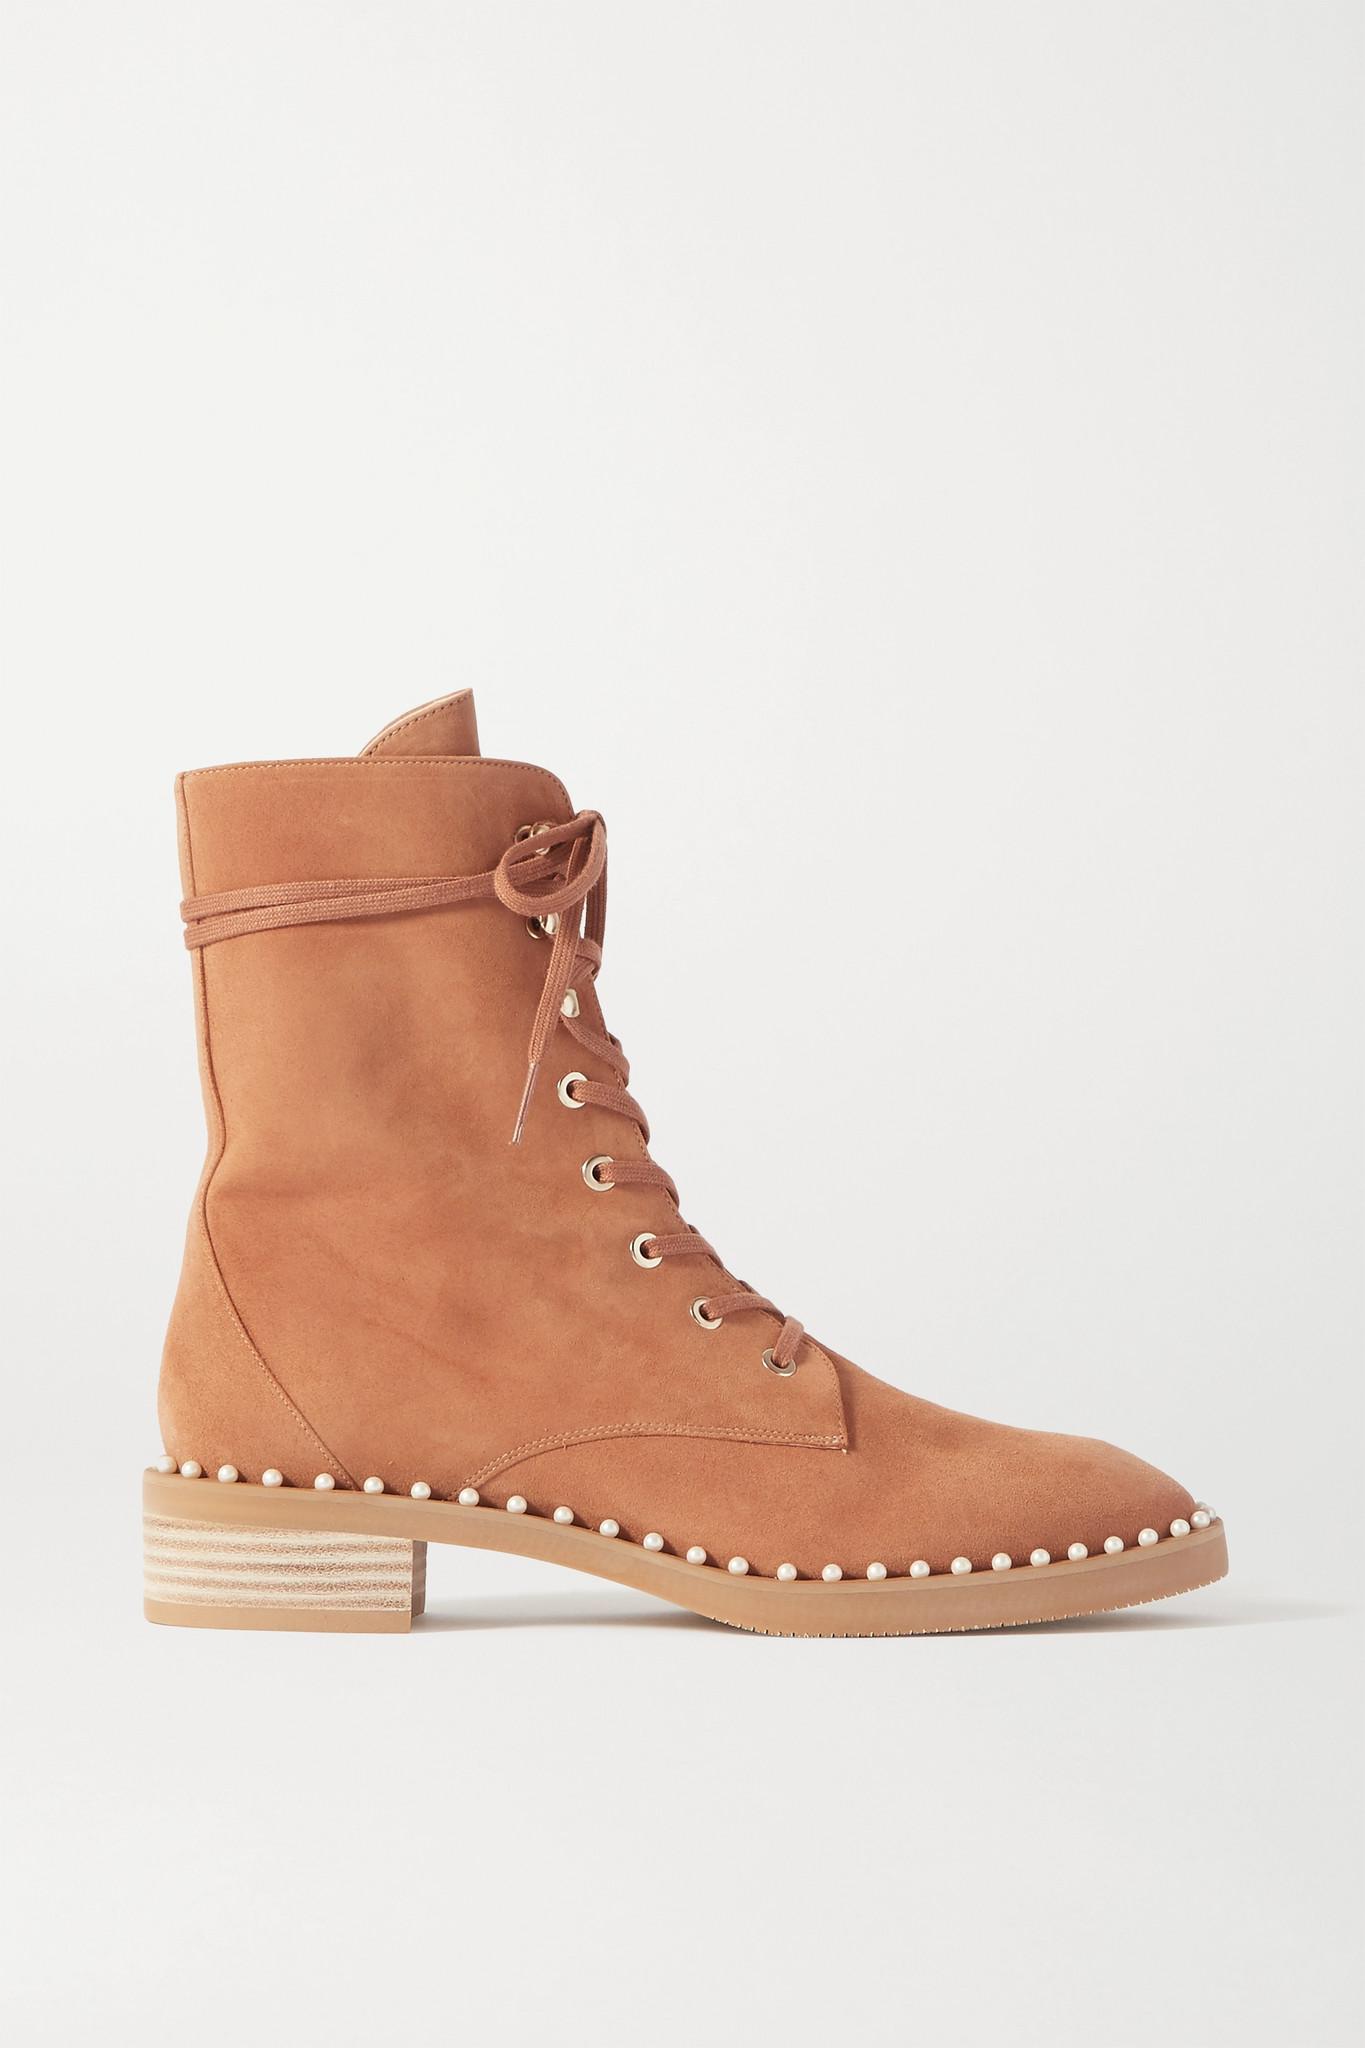 STUART WEITZMAN - Sondra 人造珍珠缀饰皮革踝靴 - 棕色 - IT35.5